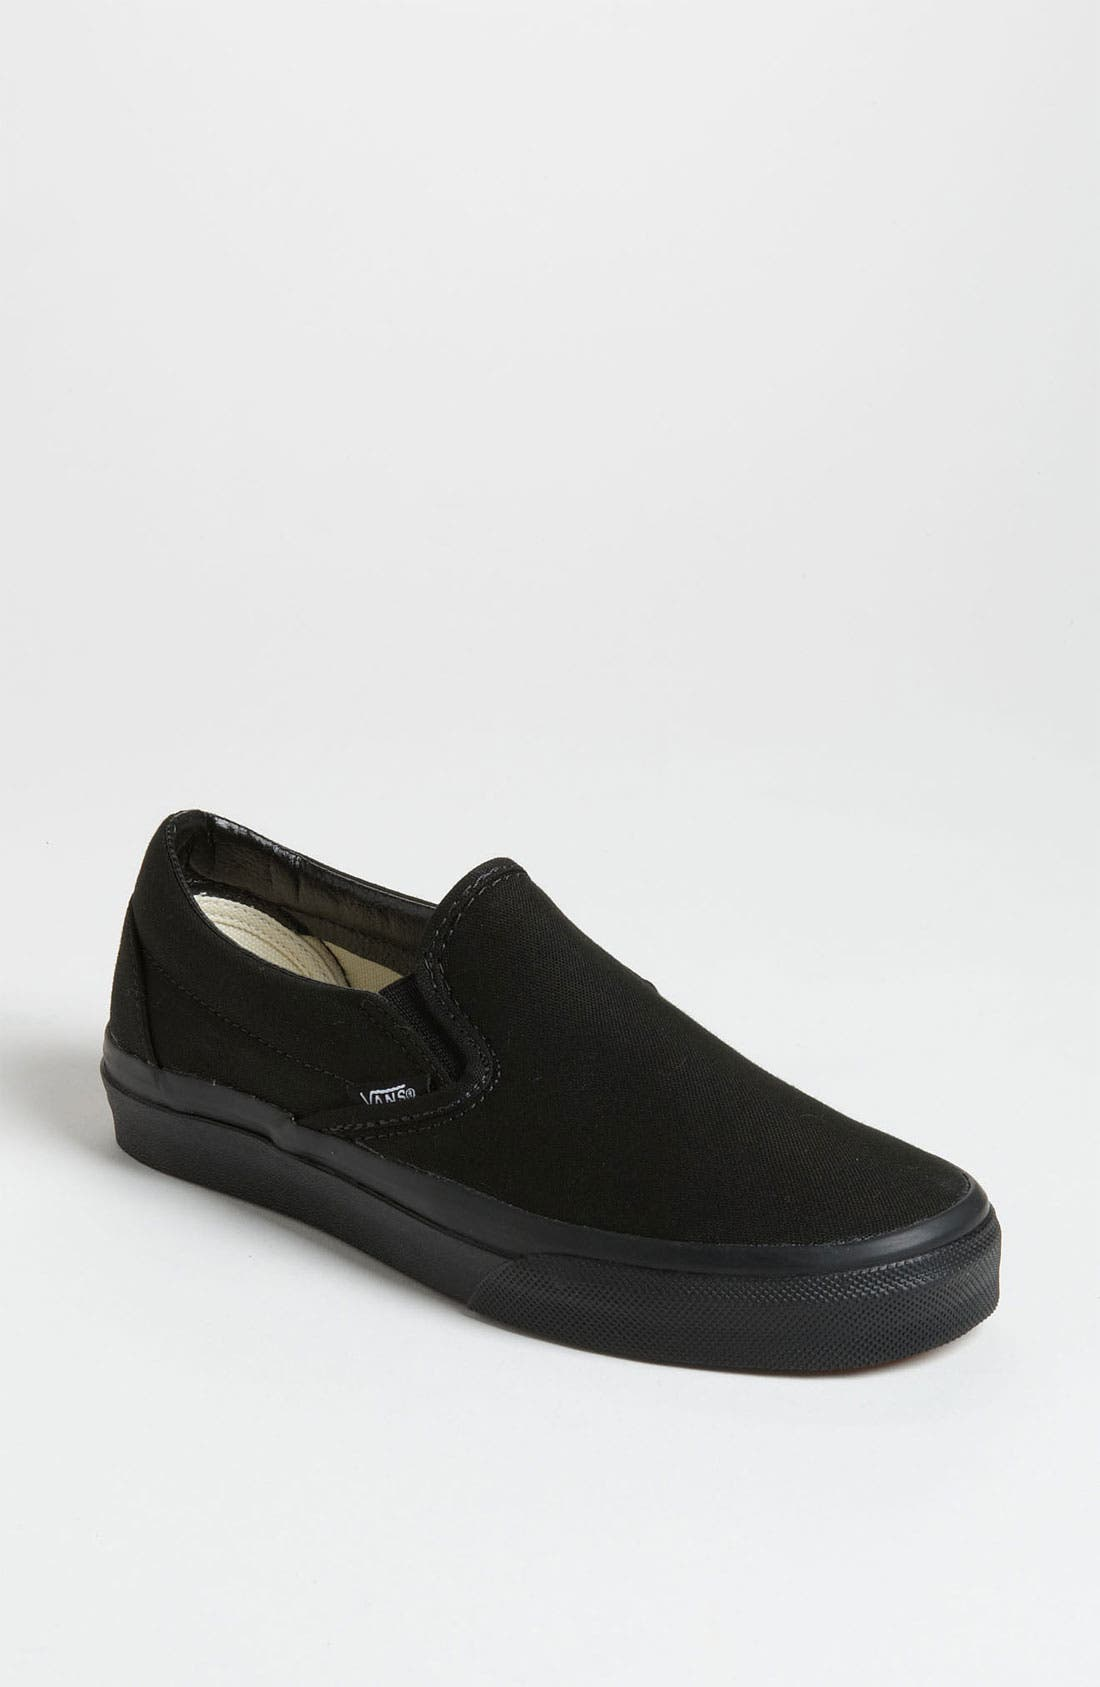 Alternate Image 1 Selected - Vans Classic Sneaker (Women)